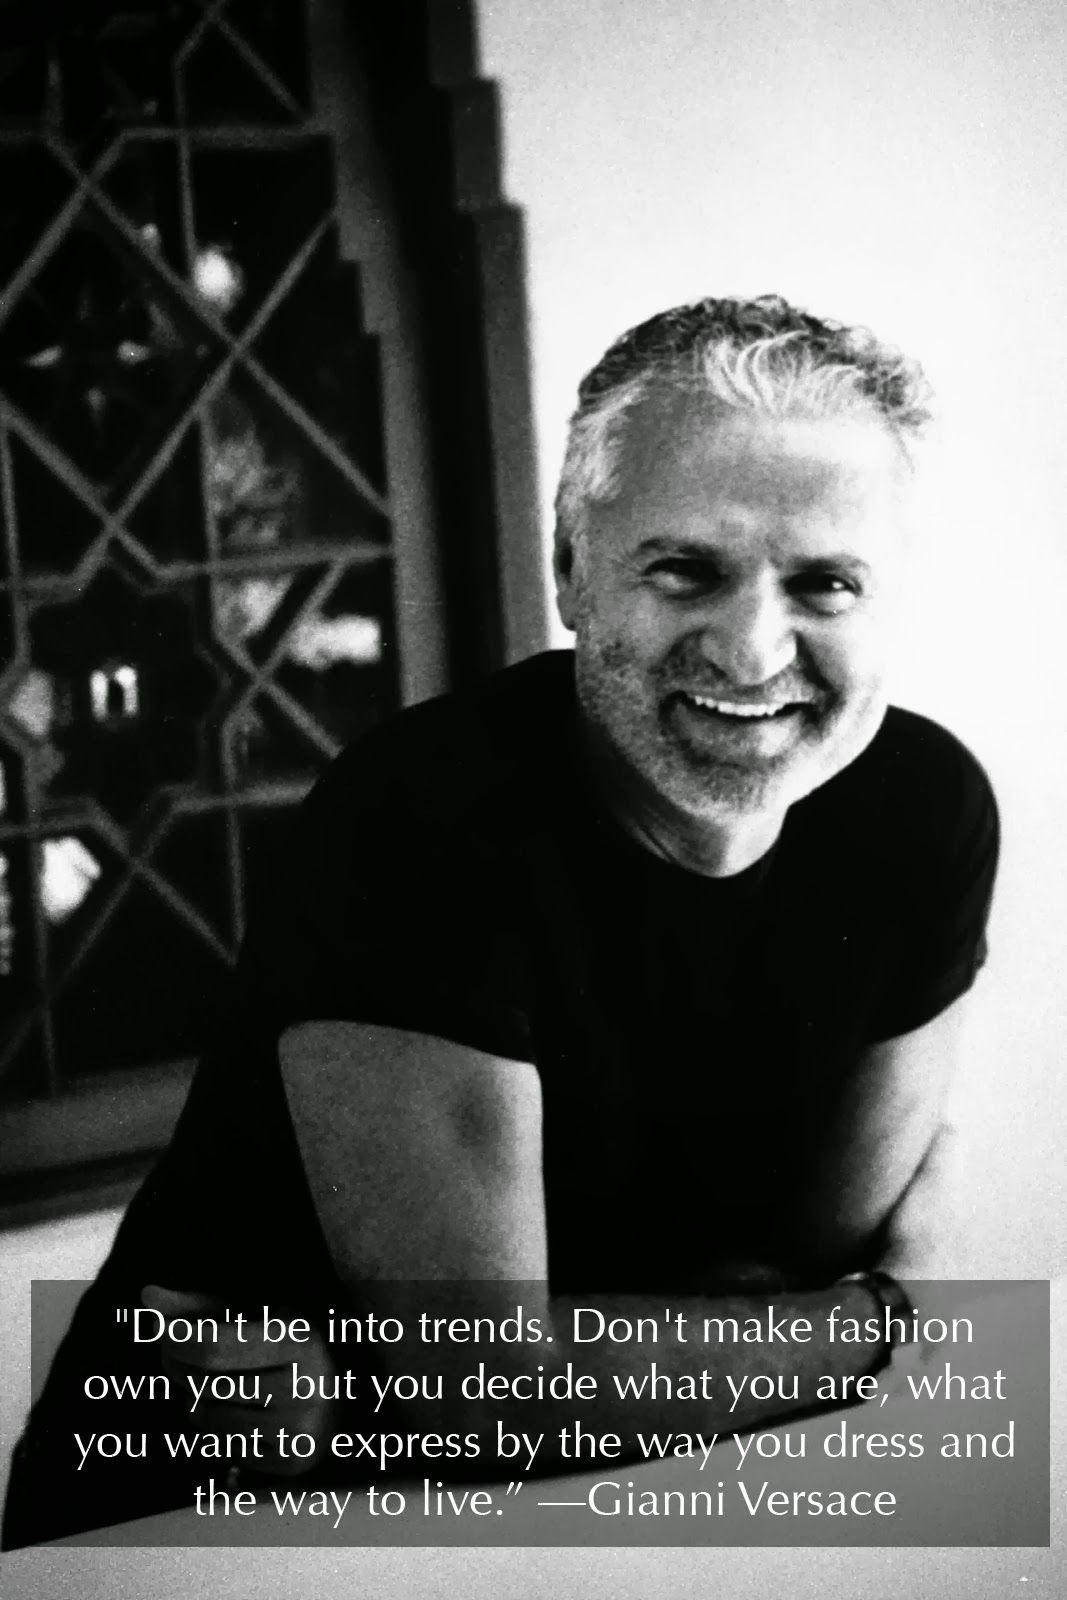 Monday Inspiration: Gianni Versace